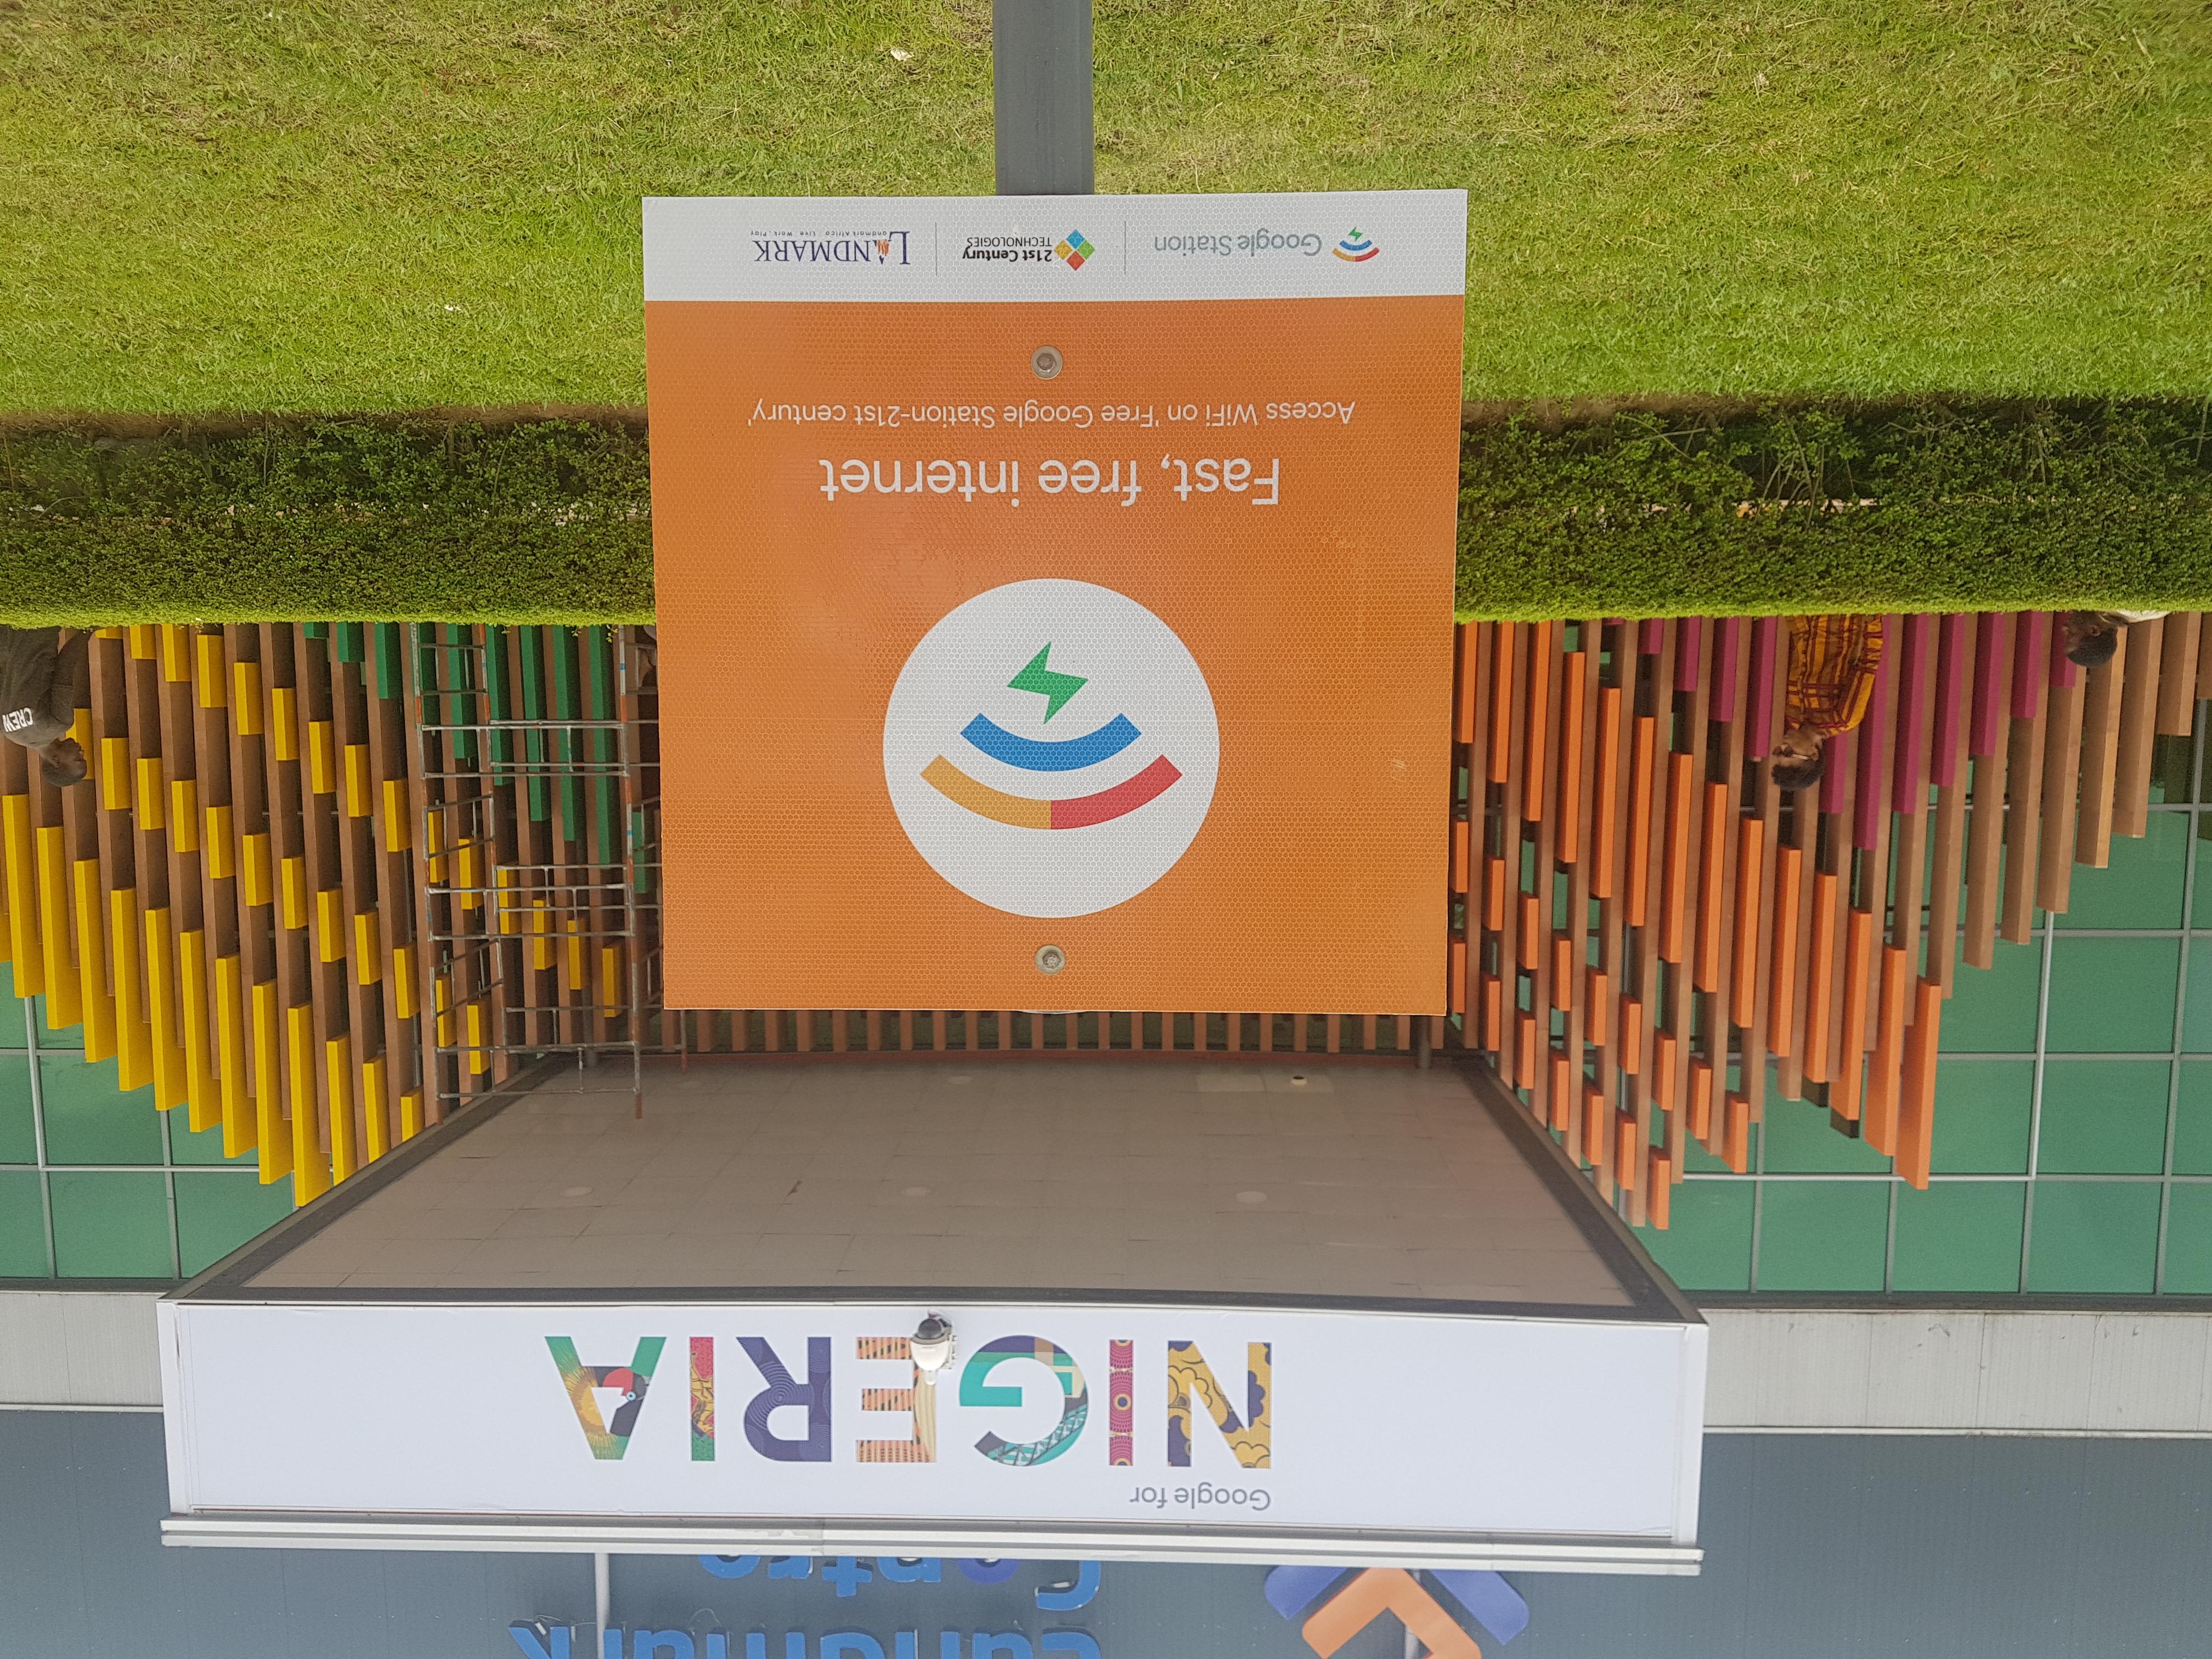 Google Station launches free public WiFi in Nigeria — Quartz Africa